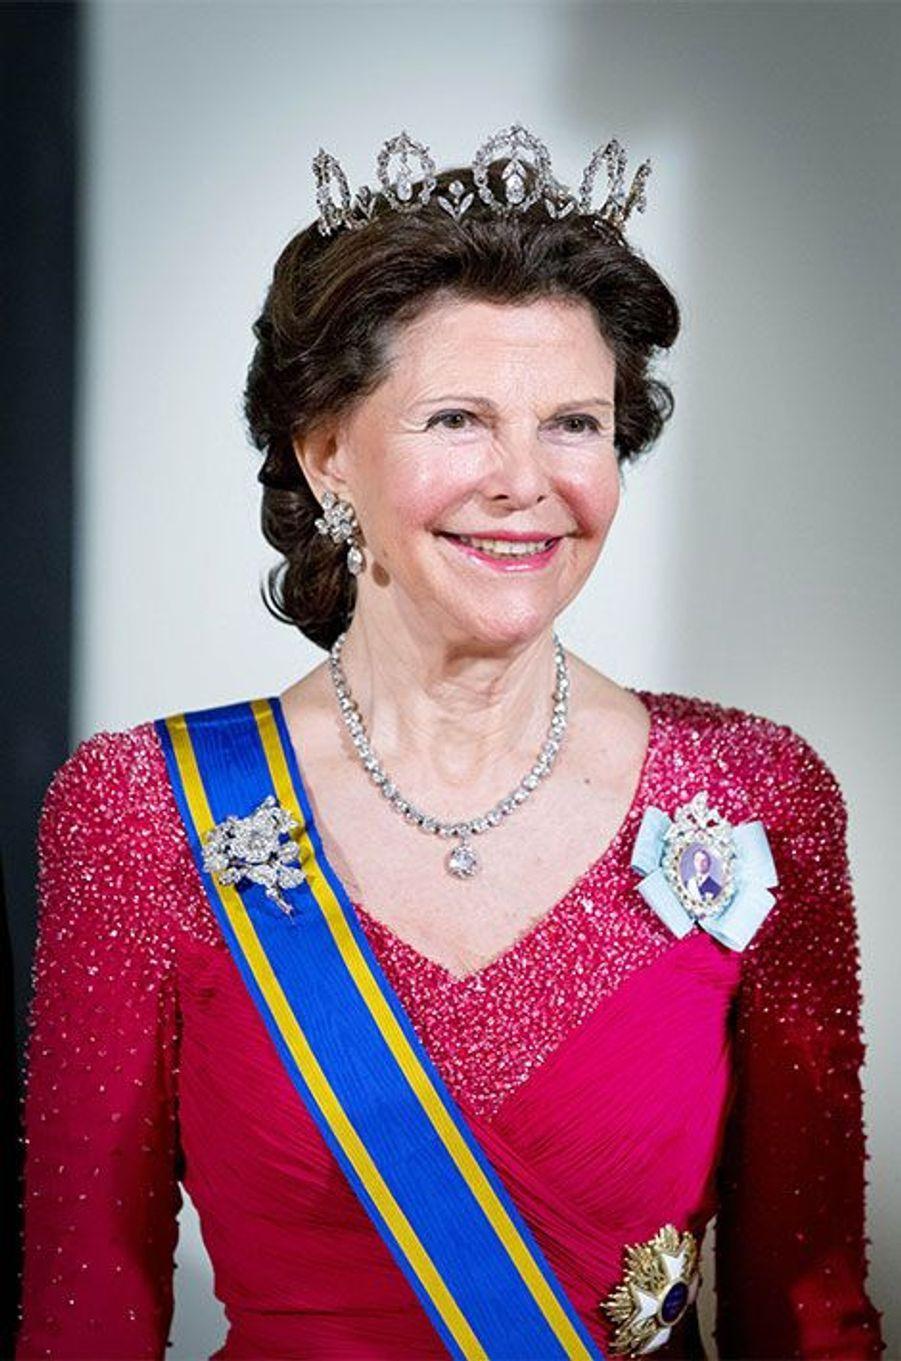 La reine Silvia de Suède